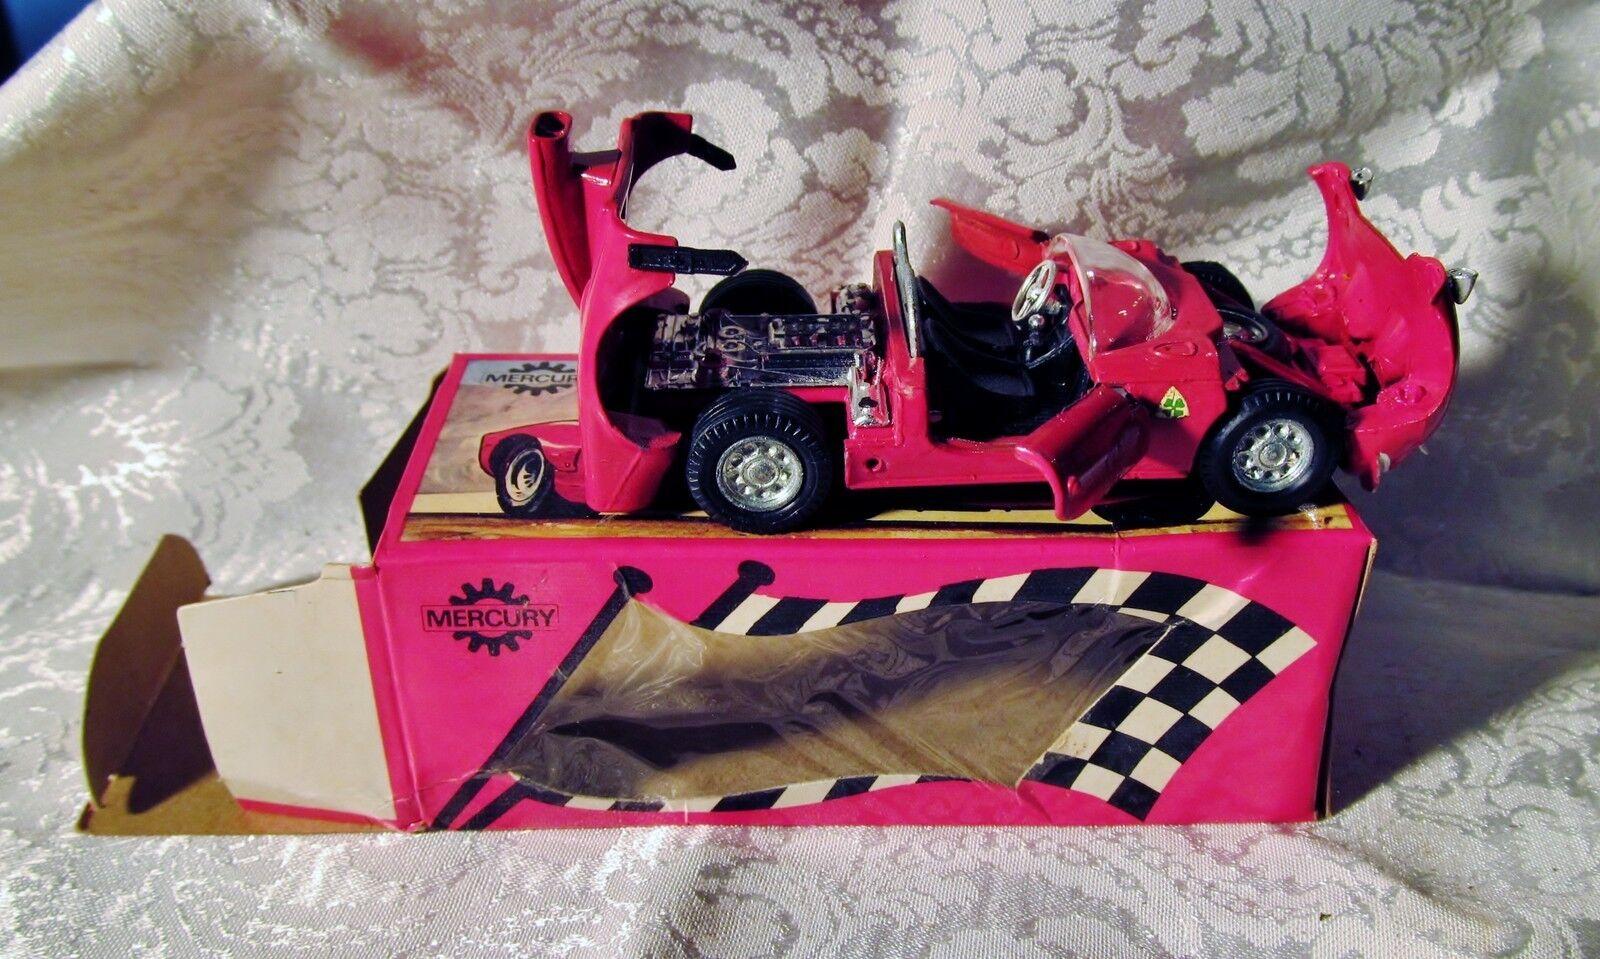 Quecksilber alfa - romeo - kunst.modell   64 - prototyp  33  rennwagen tür hood o   box